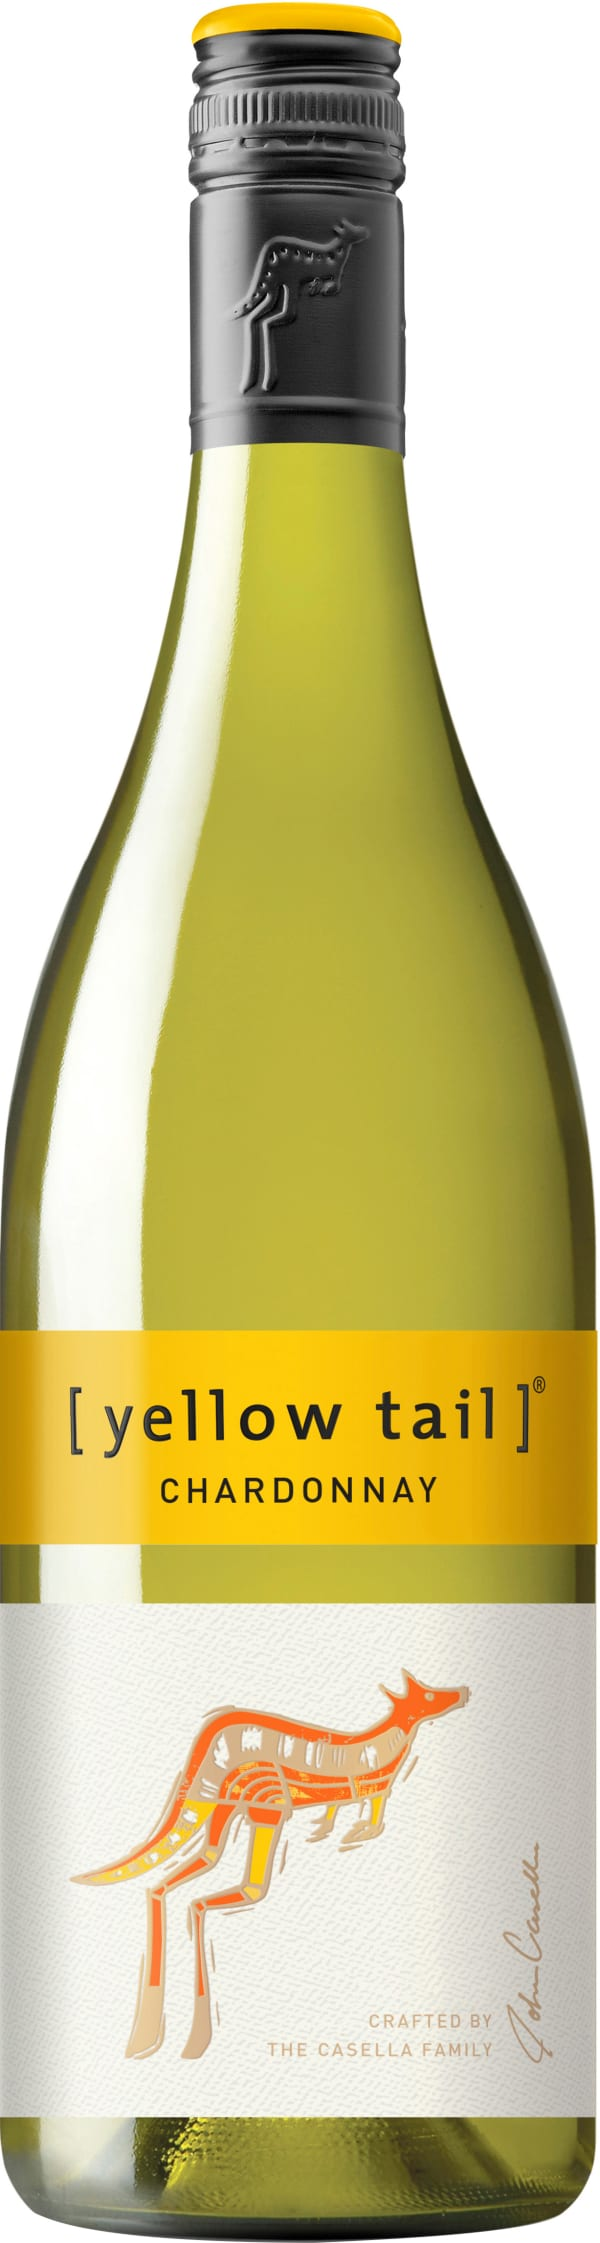 Yellow Tail Chardonnay 2017